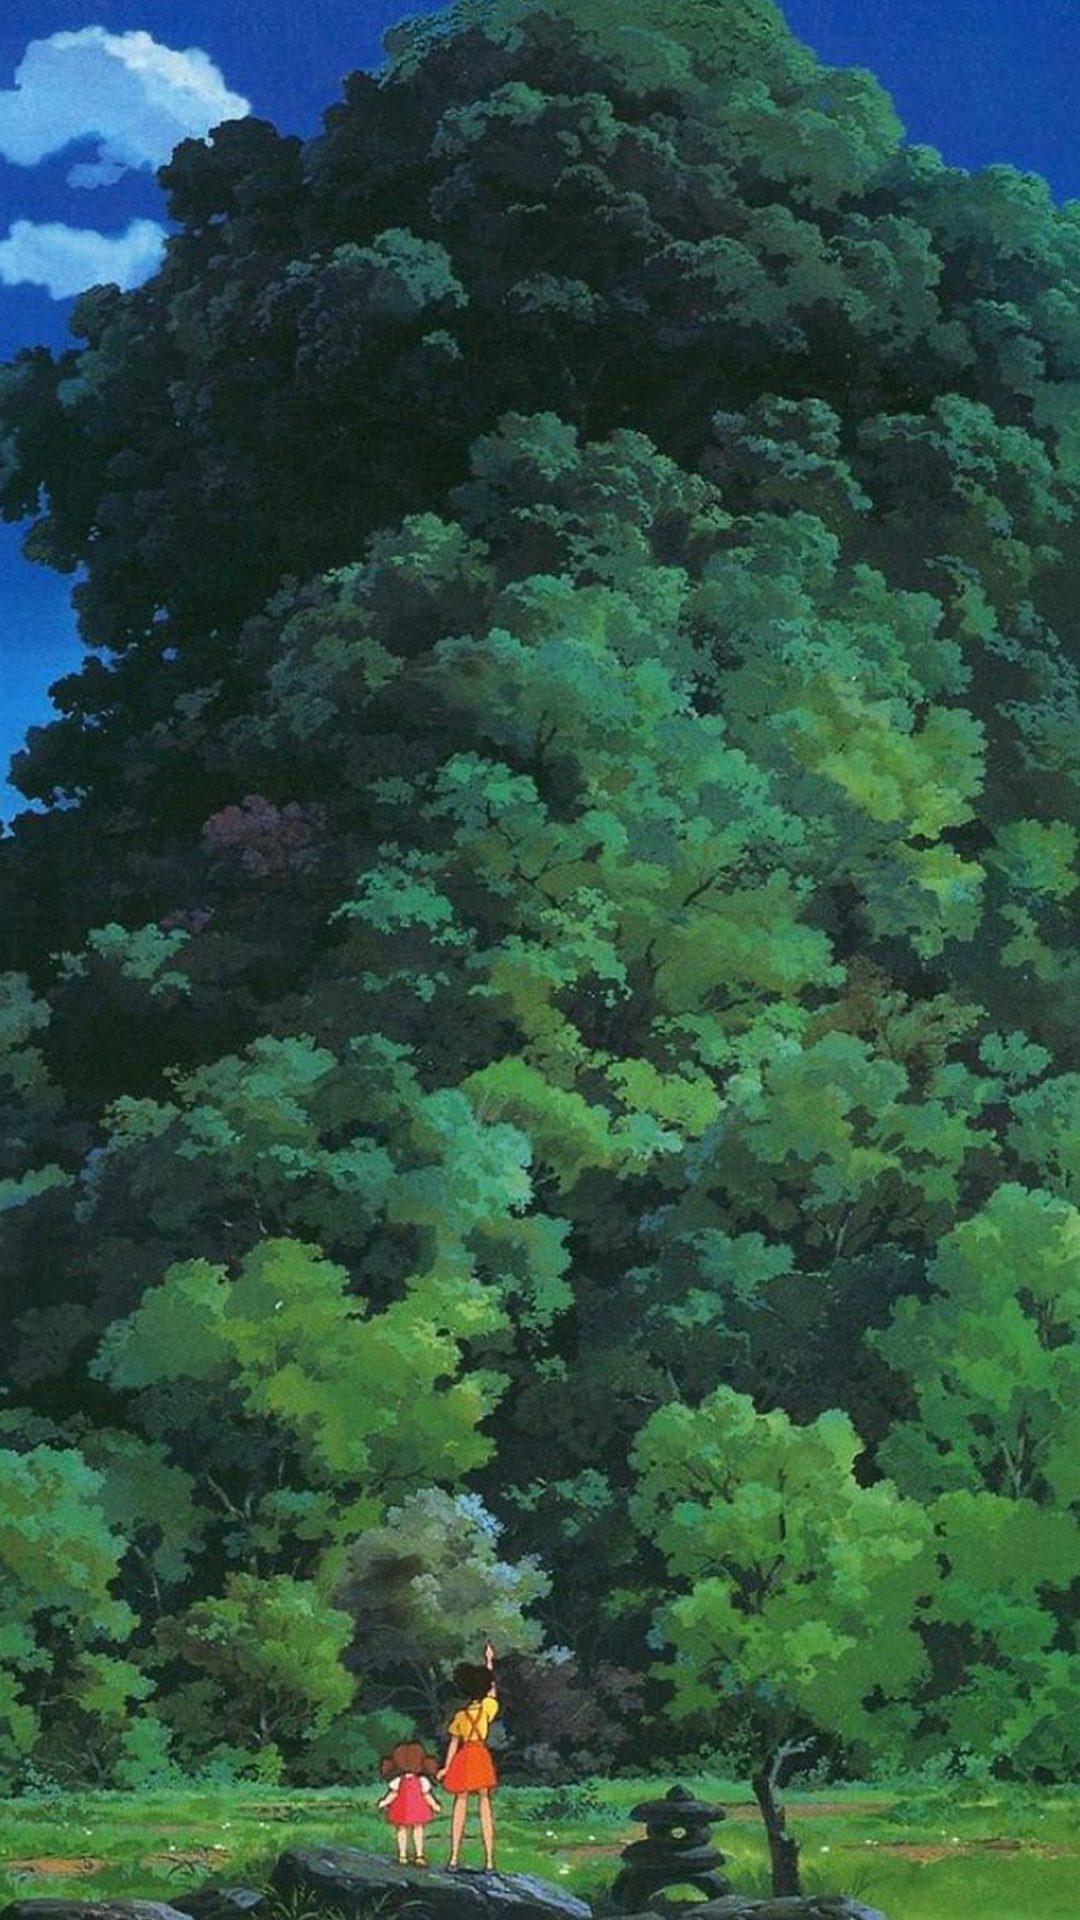 Studio Ghibli Tree Green Art Illustration Love Anime